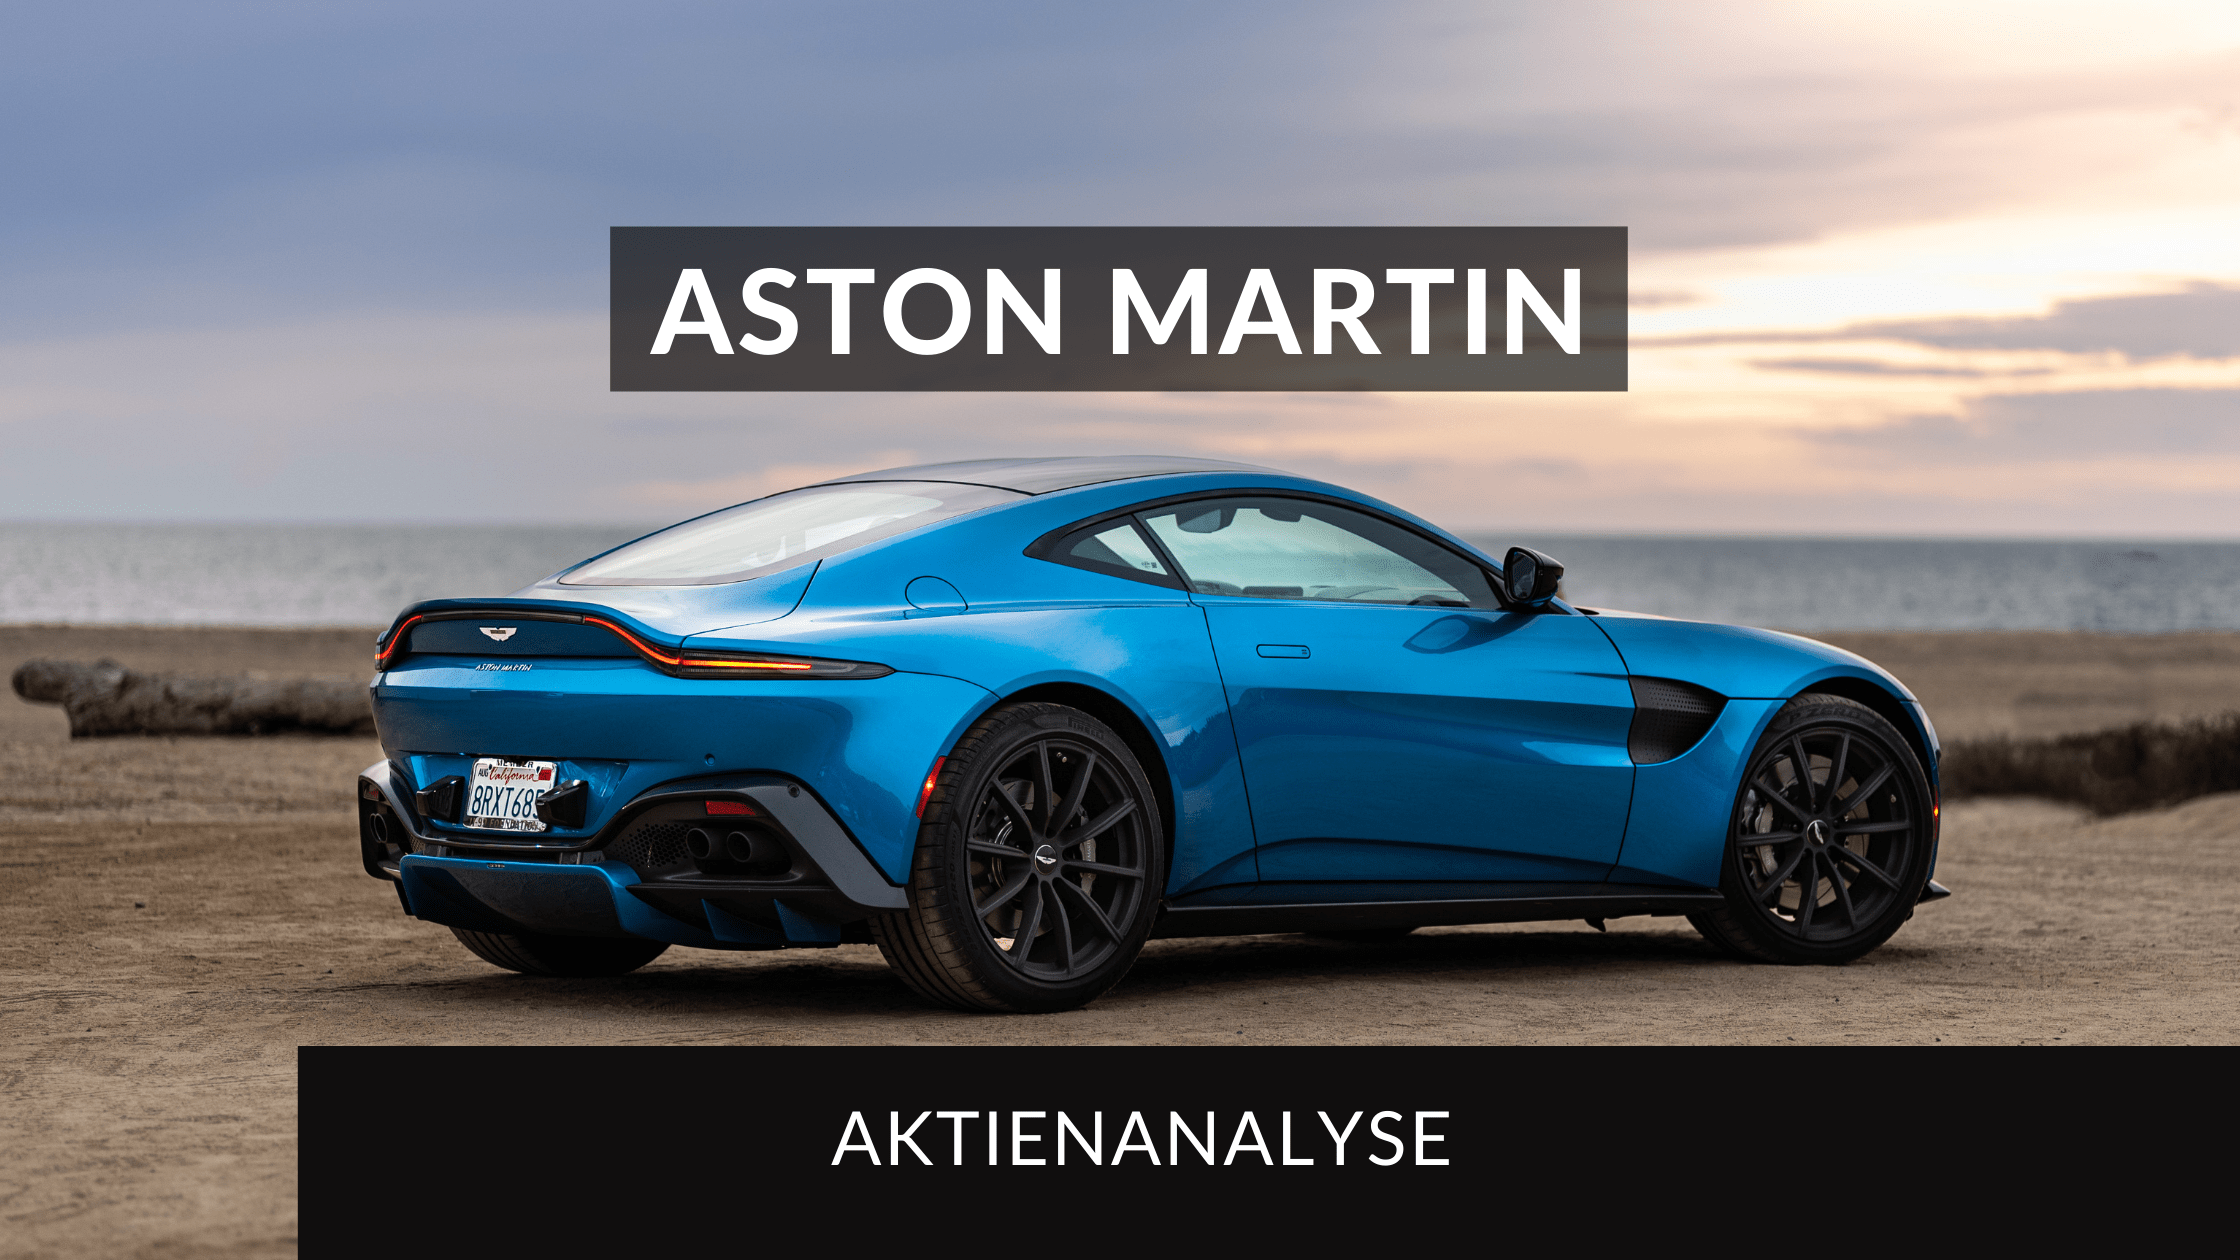 Aston Martin Aktienanalyse